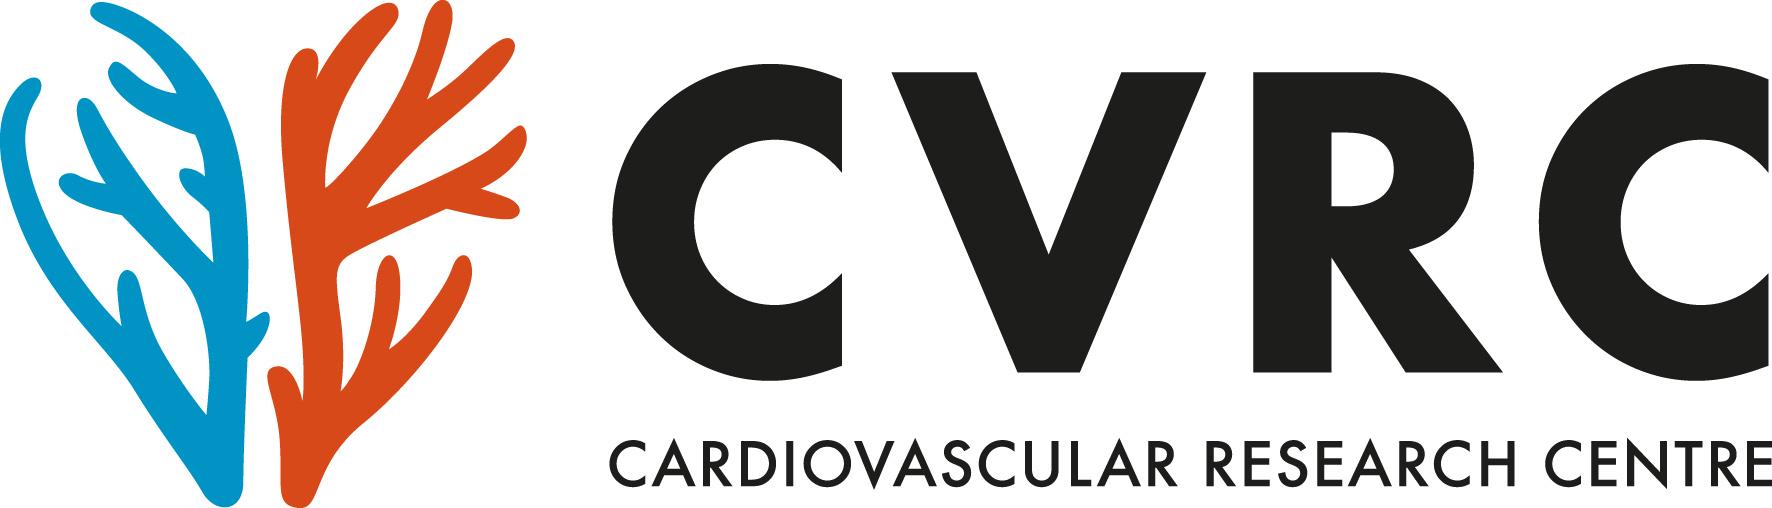 Cardiovascular Research Centre Rebro University